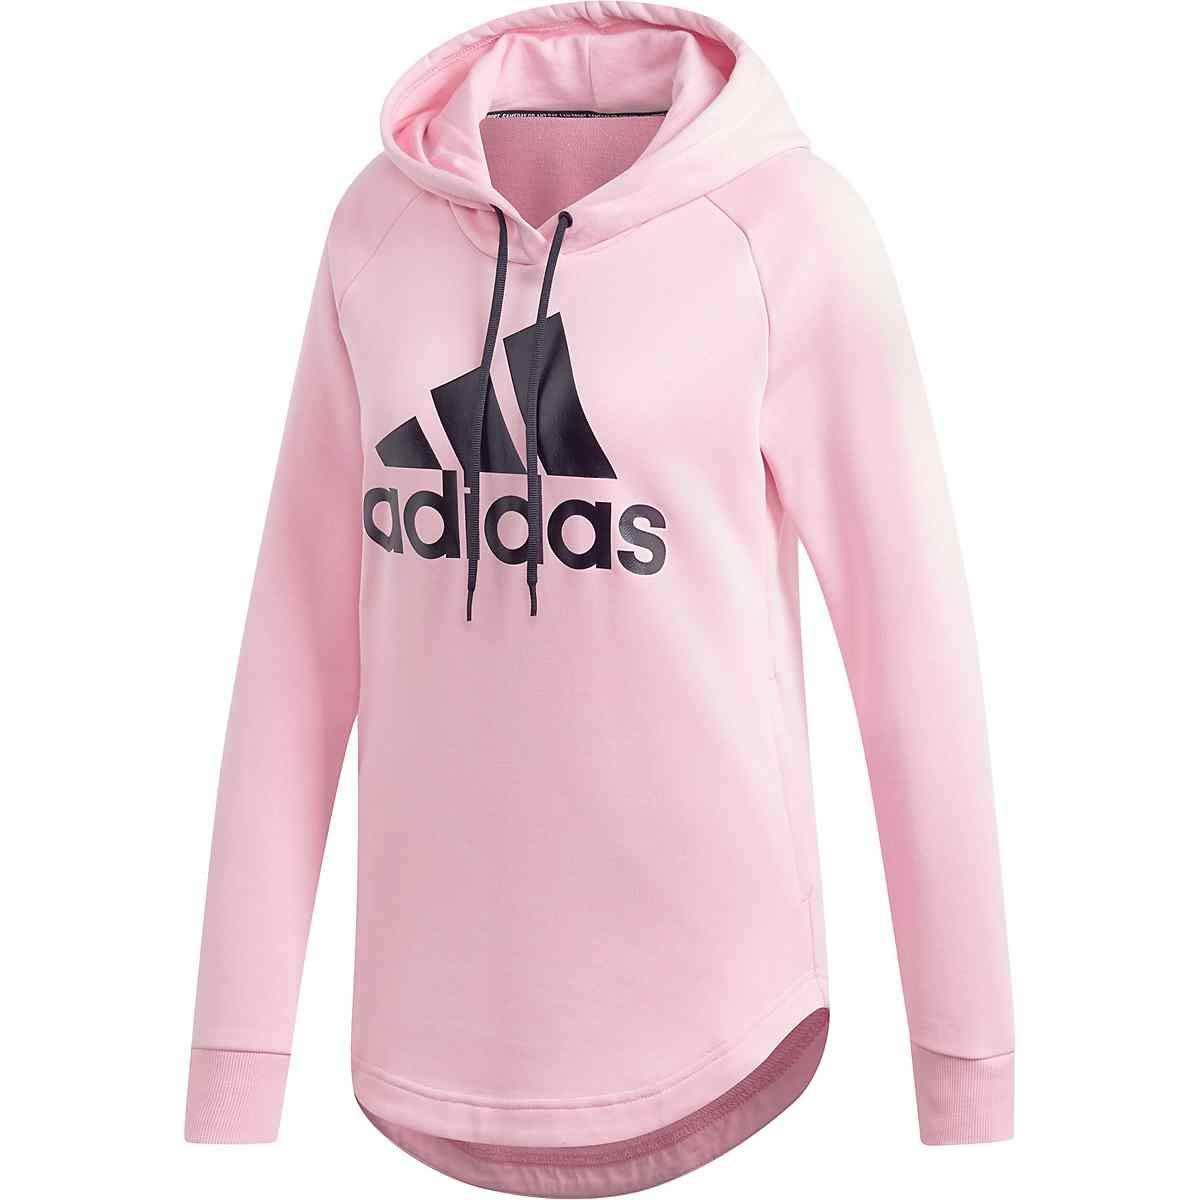 True PinkBlack adidas Women's Badge of Sport Over Head Hoodie